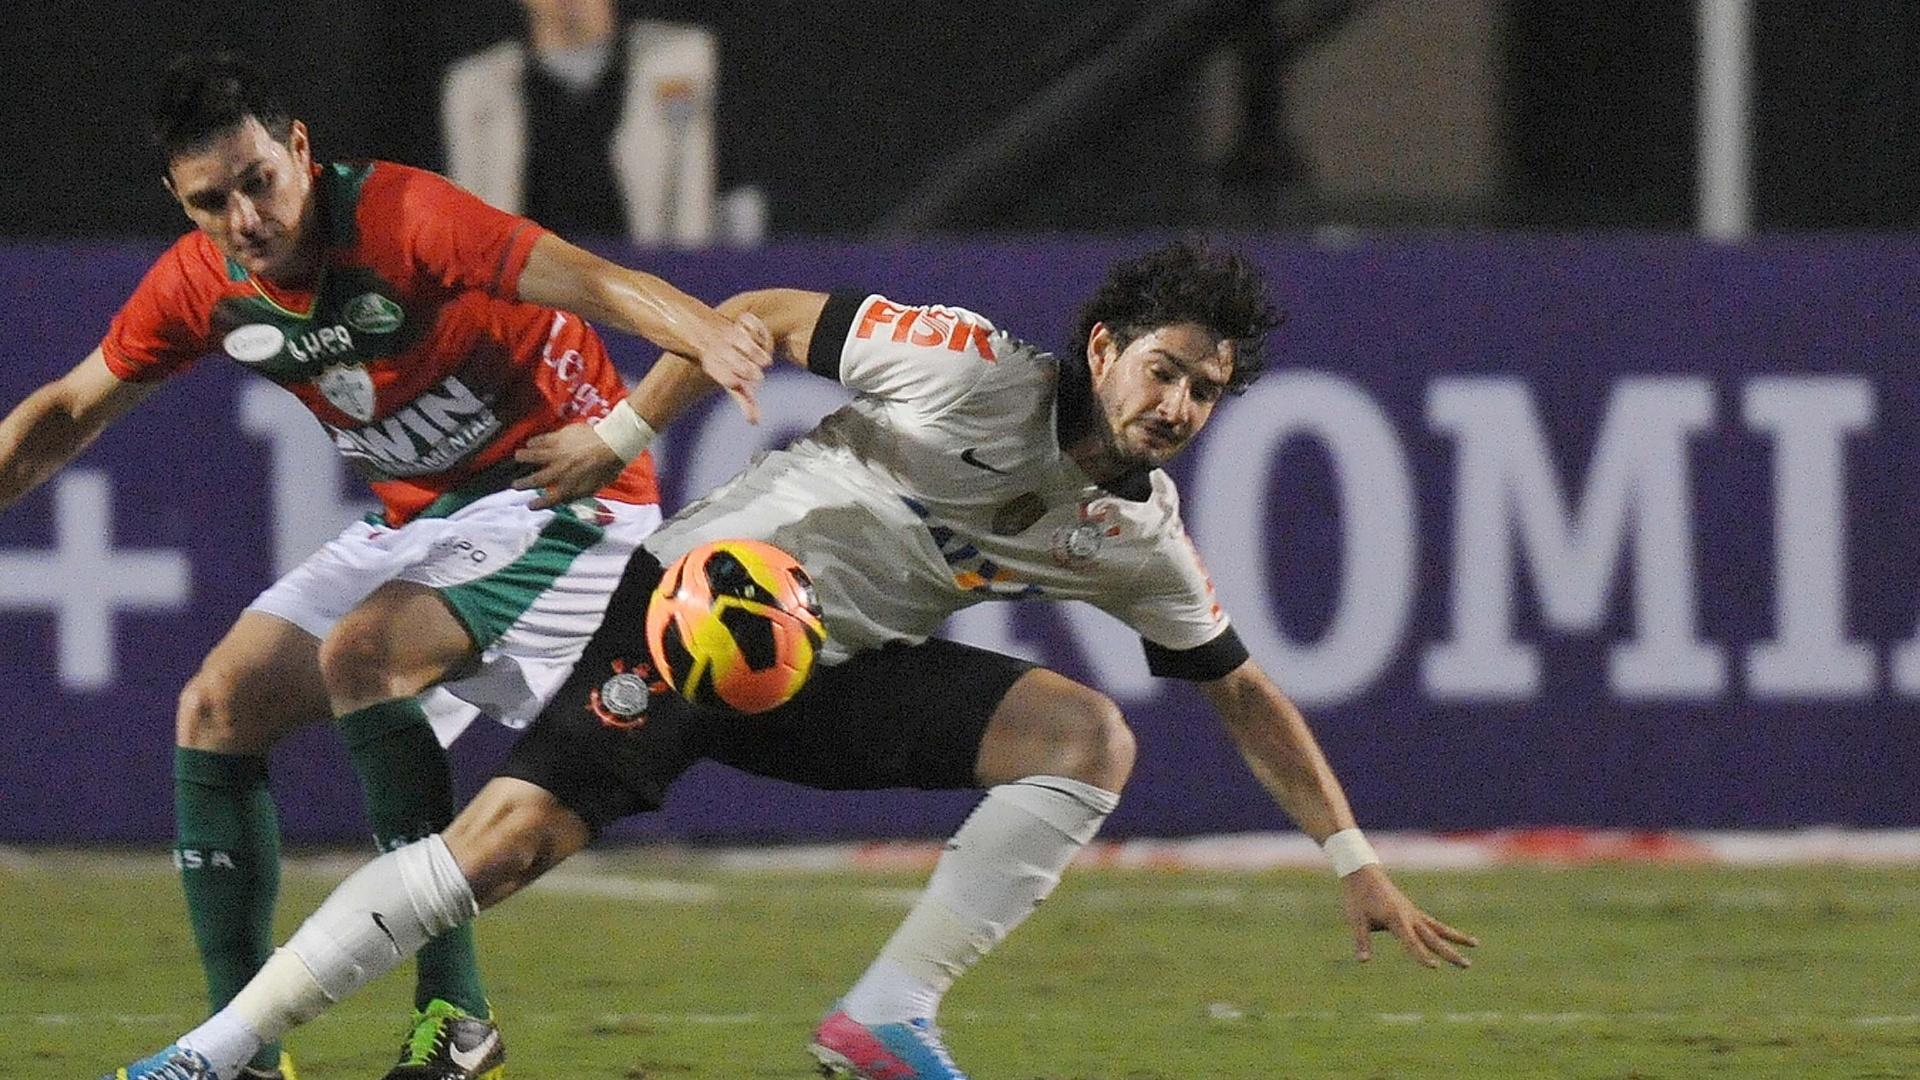 08.jun.2013 - Alexandre Pato, atacante do Corinthians, disputa bola com a defesa da Portuguesa durante jogo pelo Campeonato Brasileiro